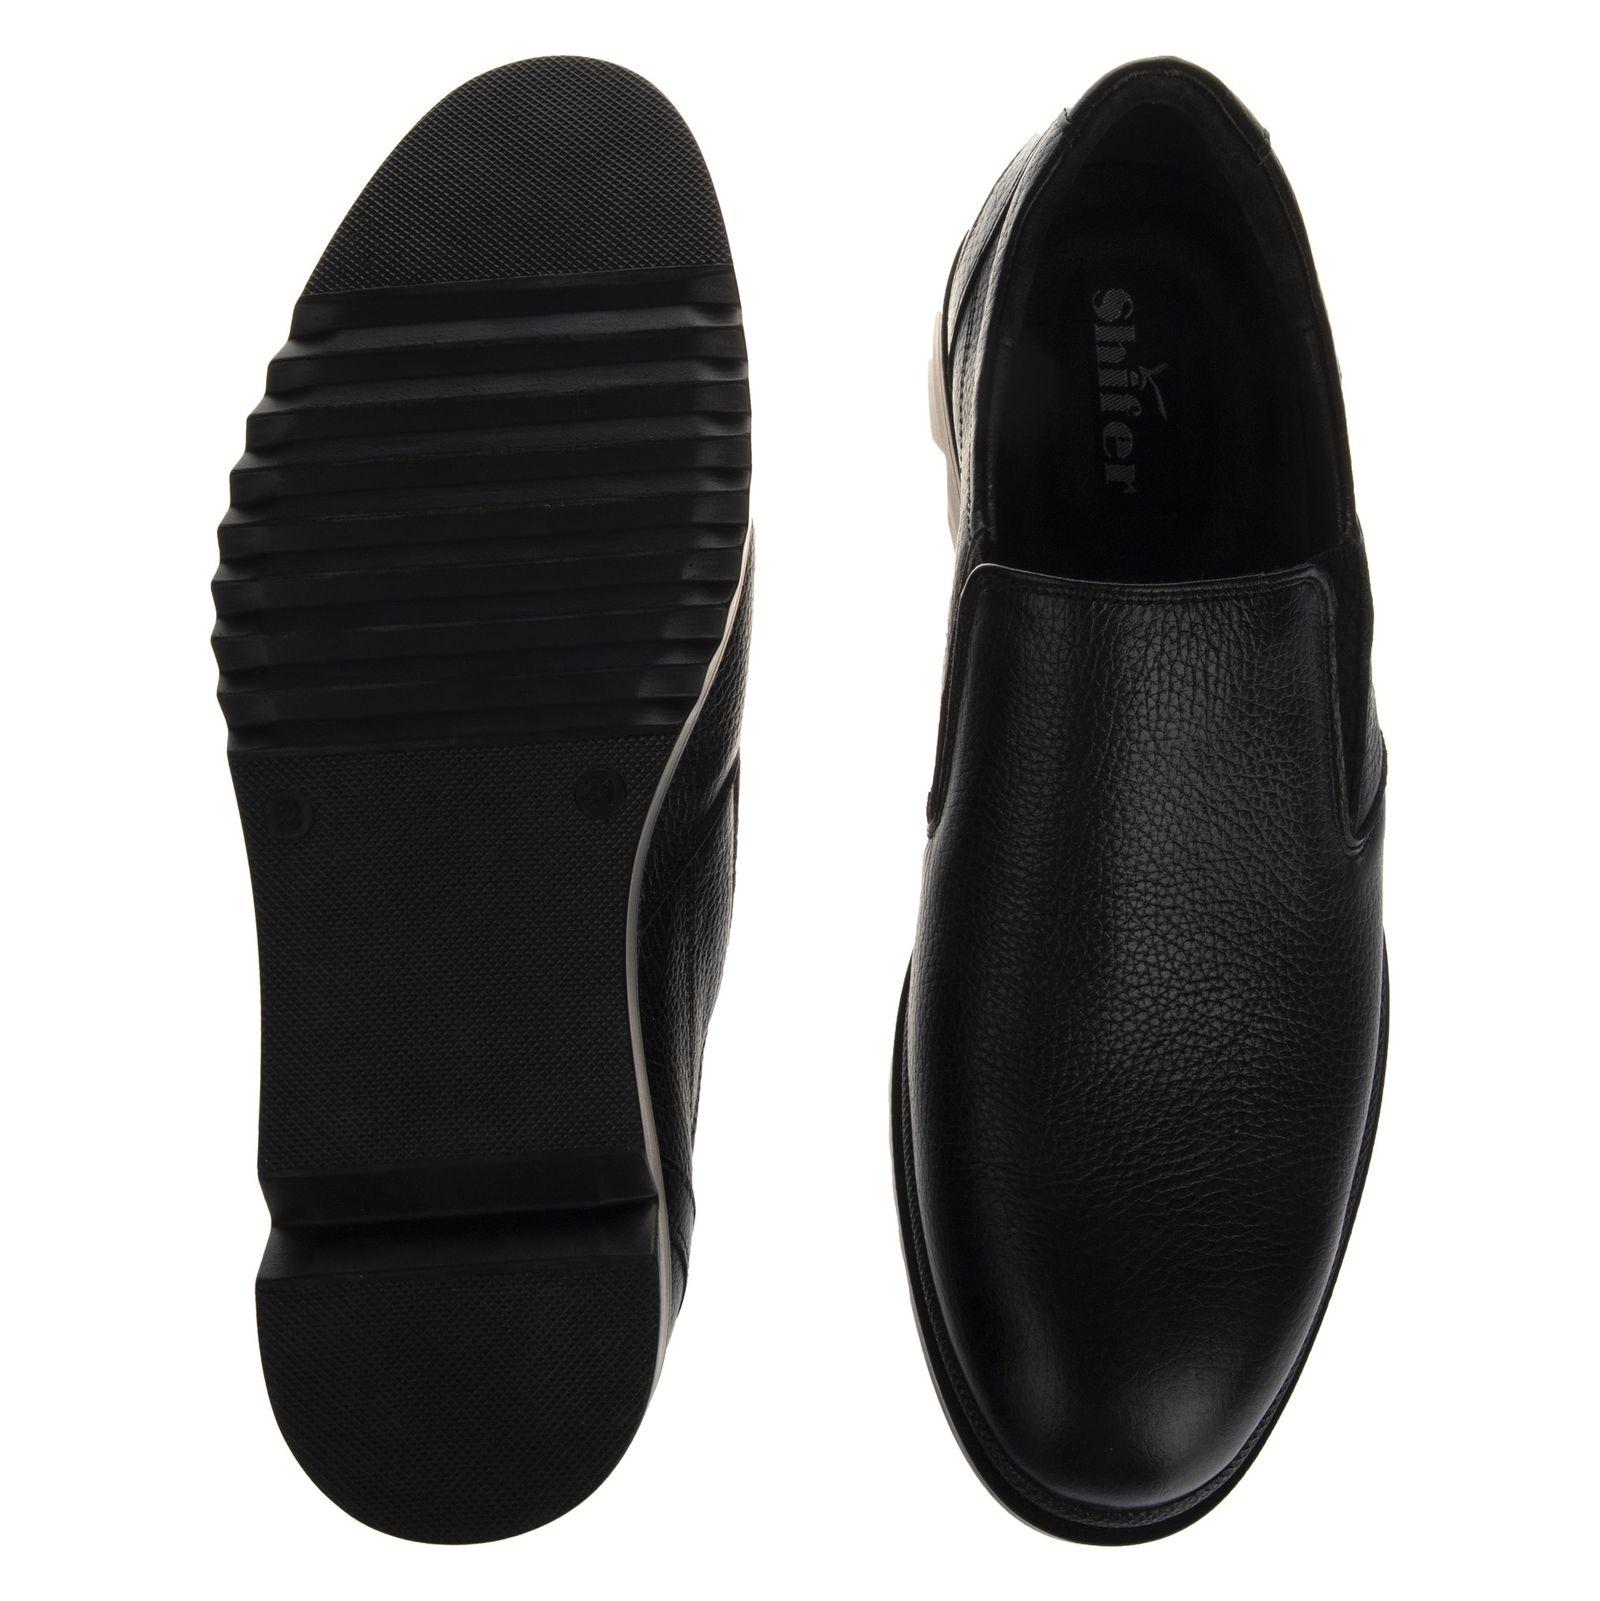 کفش روزمره مردانه شیفر مدل 7160A-101 -  - 4